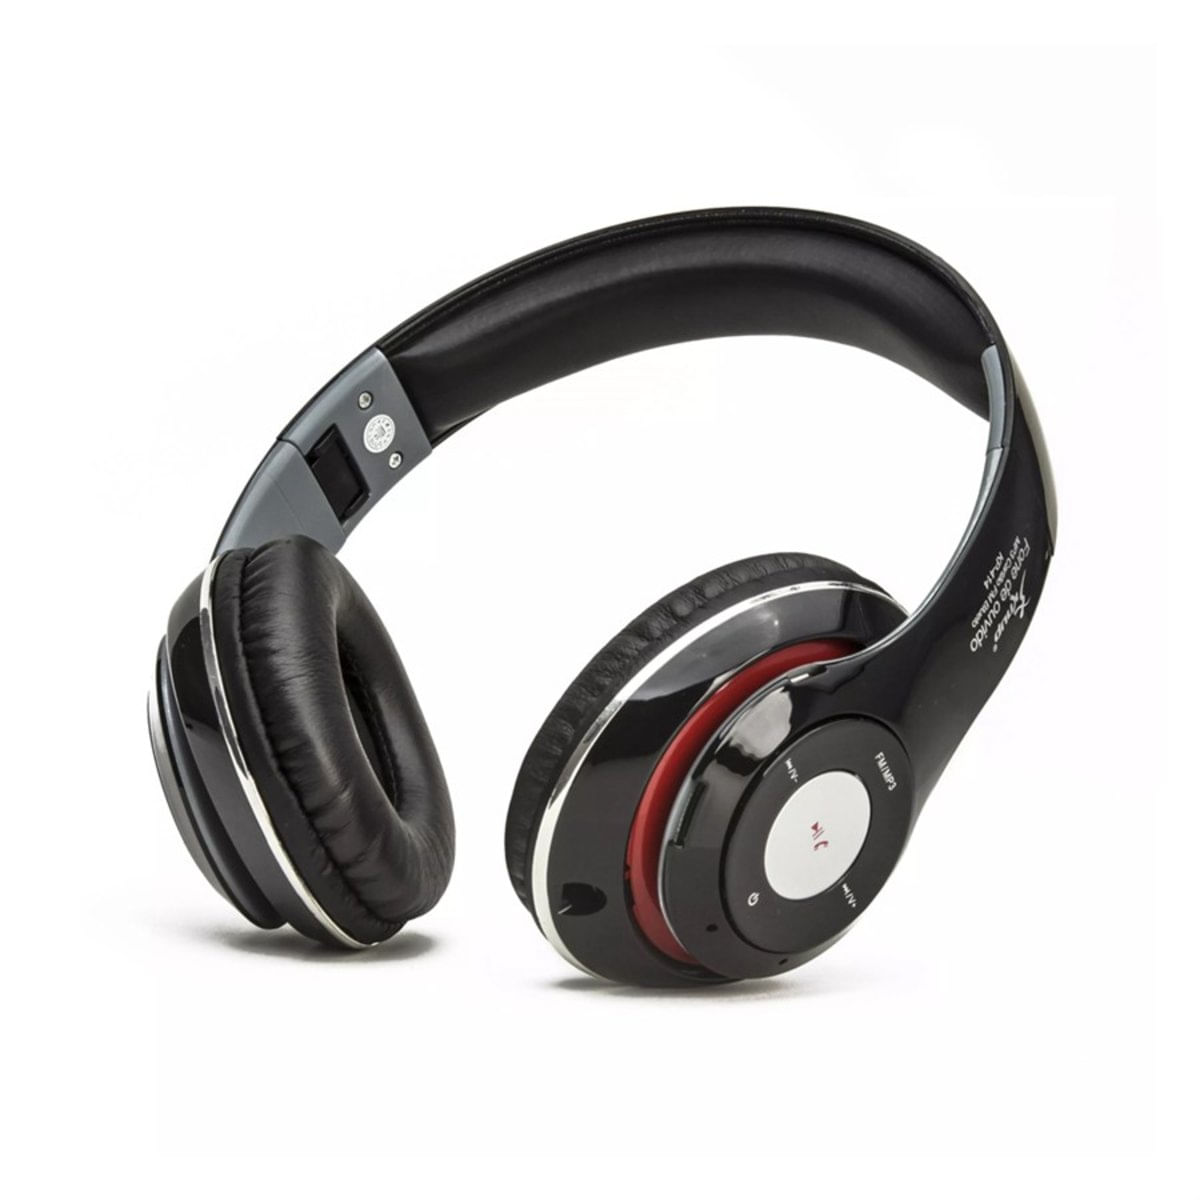 Fone de Ouvido Headphone Wireless Sound Knup Kp414